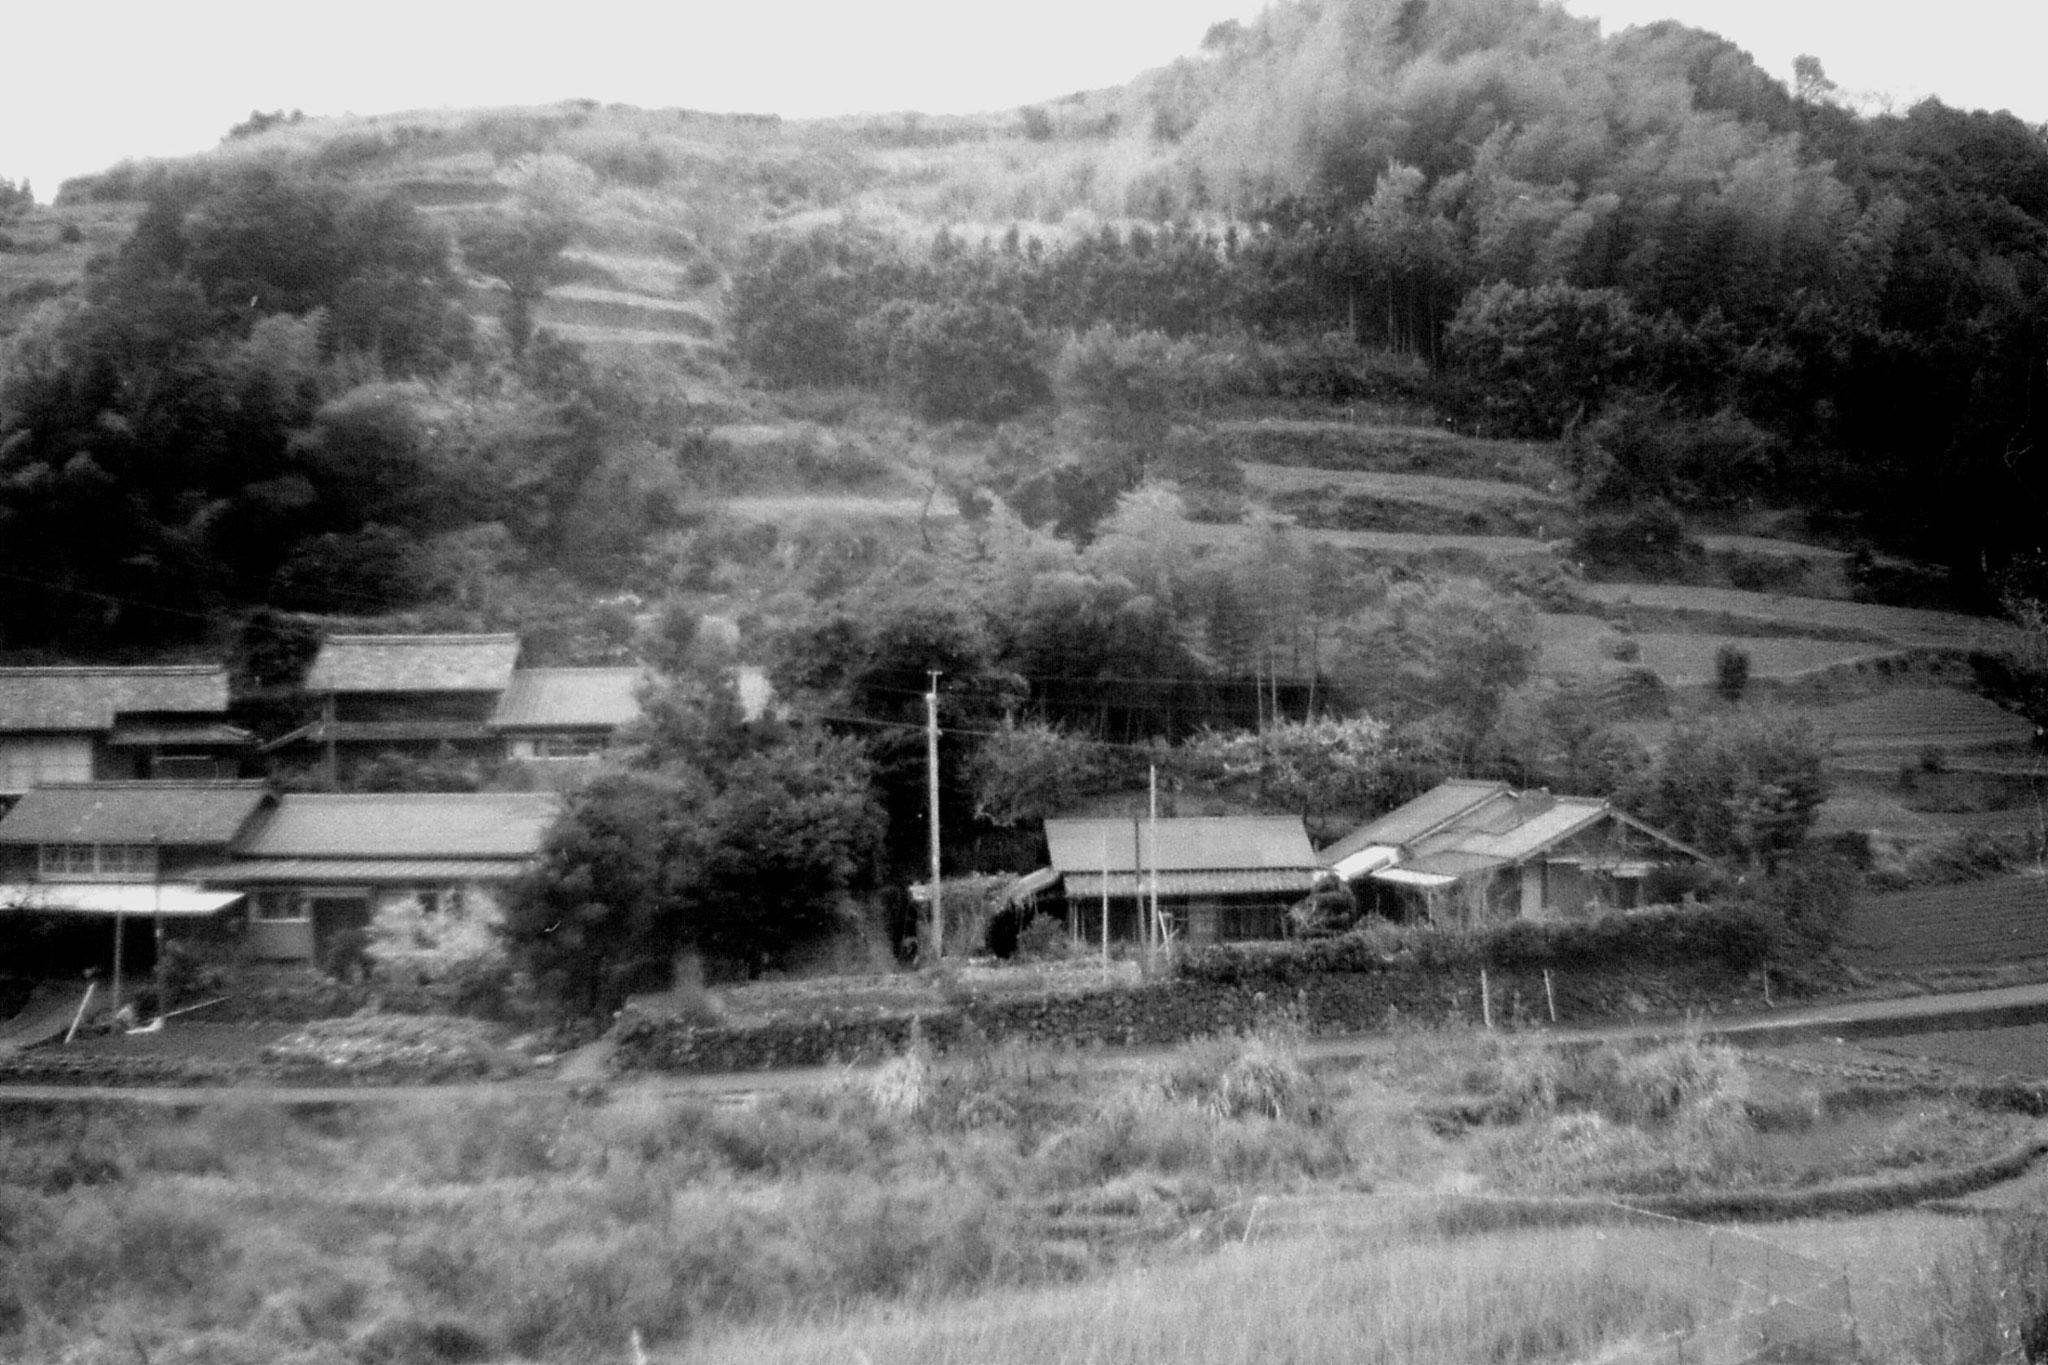 19/1/1989: 19: nr Satsuma Okawa